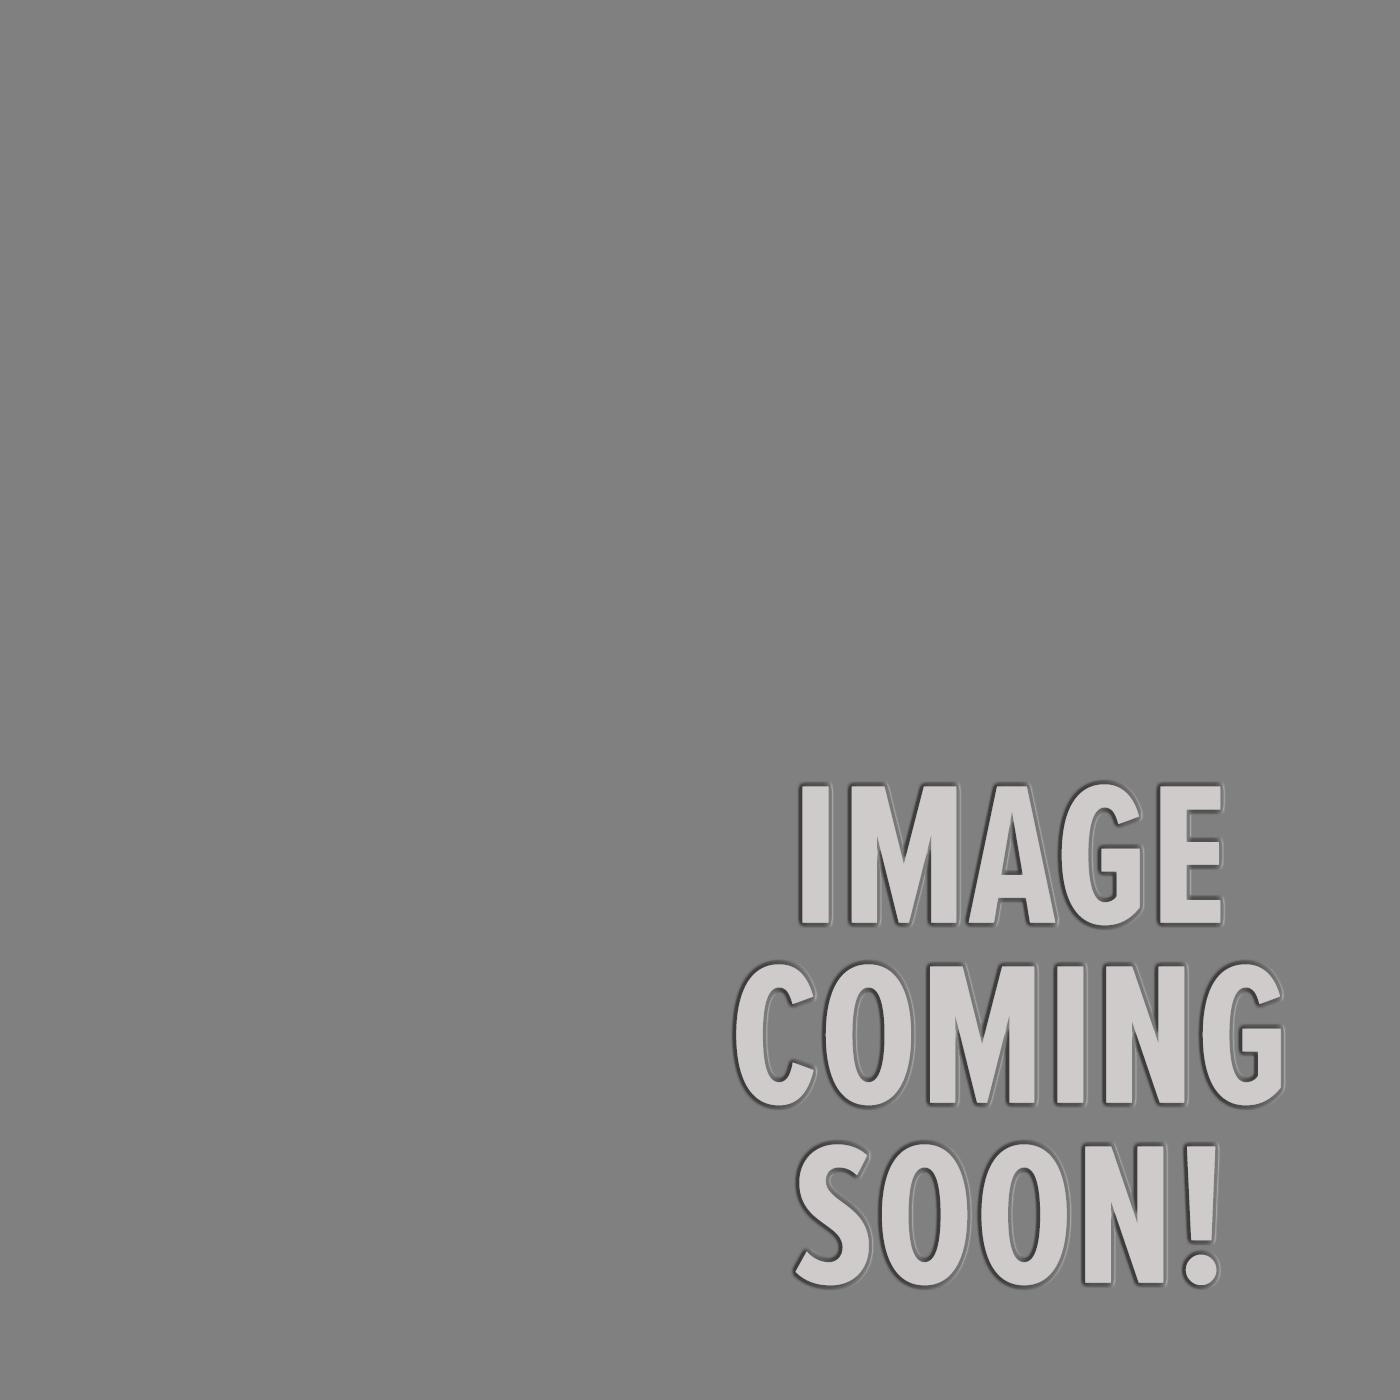 Image for SE Custom 24 Electric Guitar from SamAsh